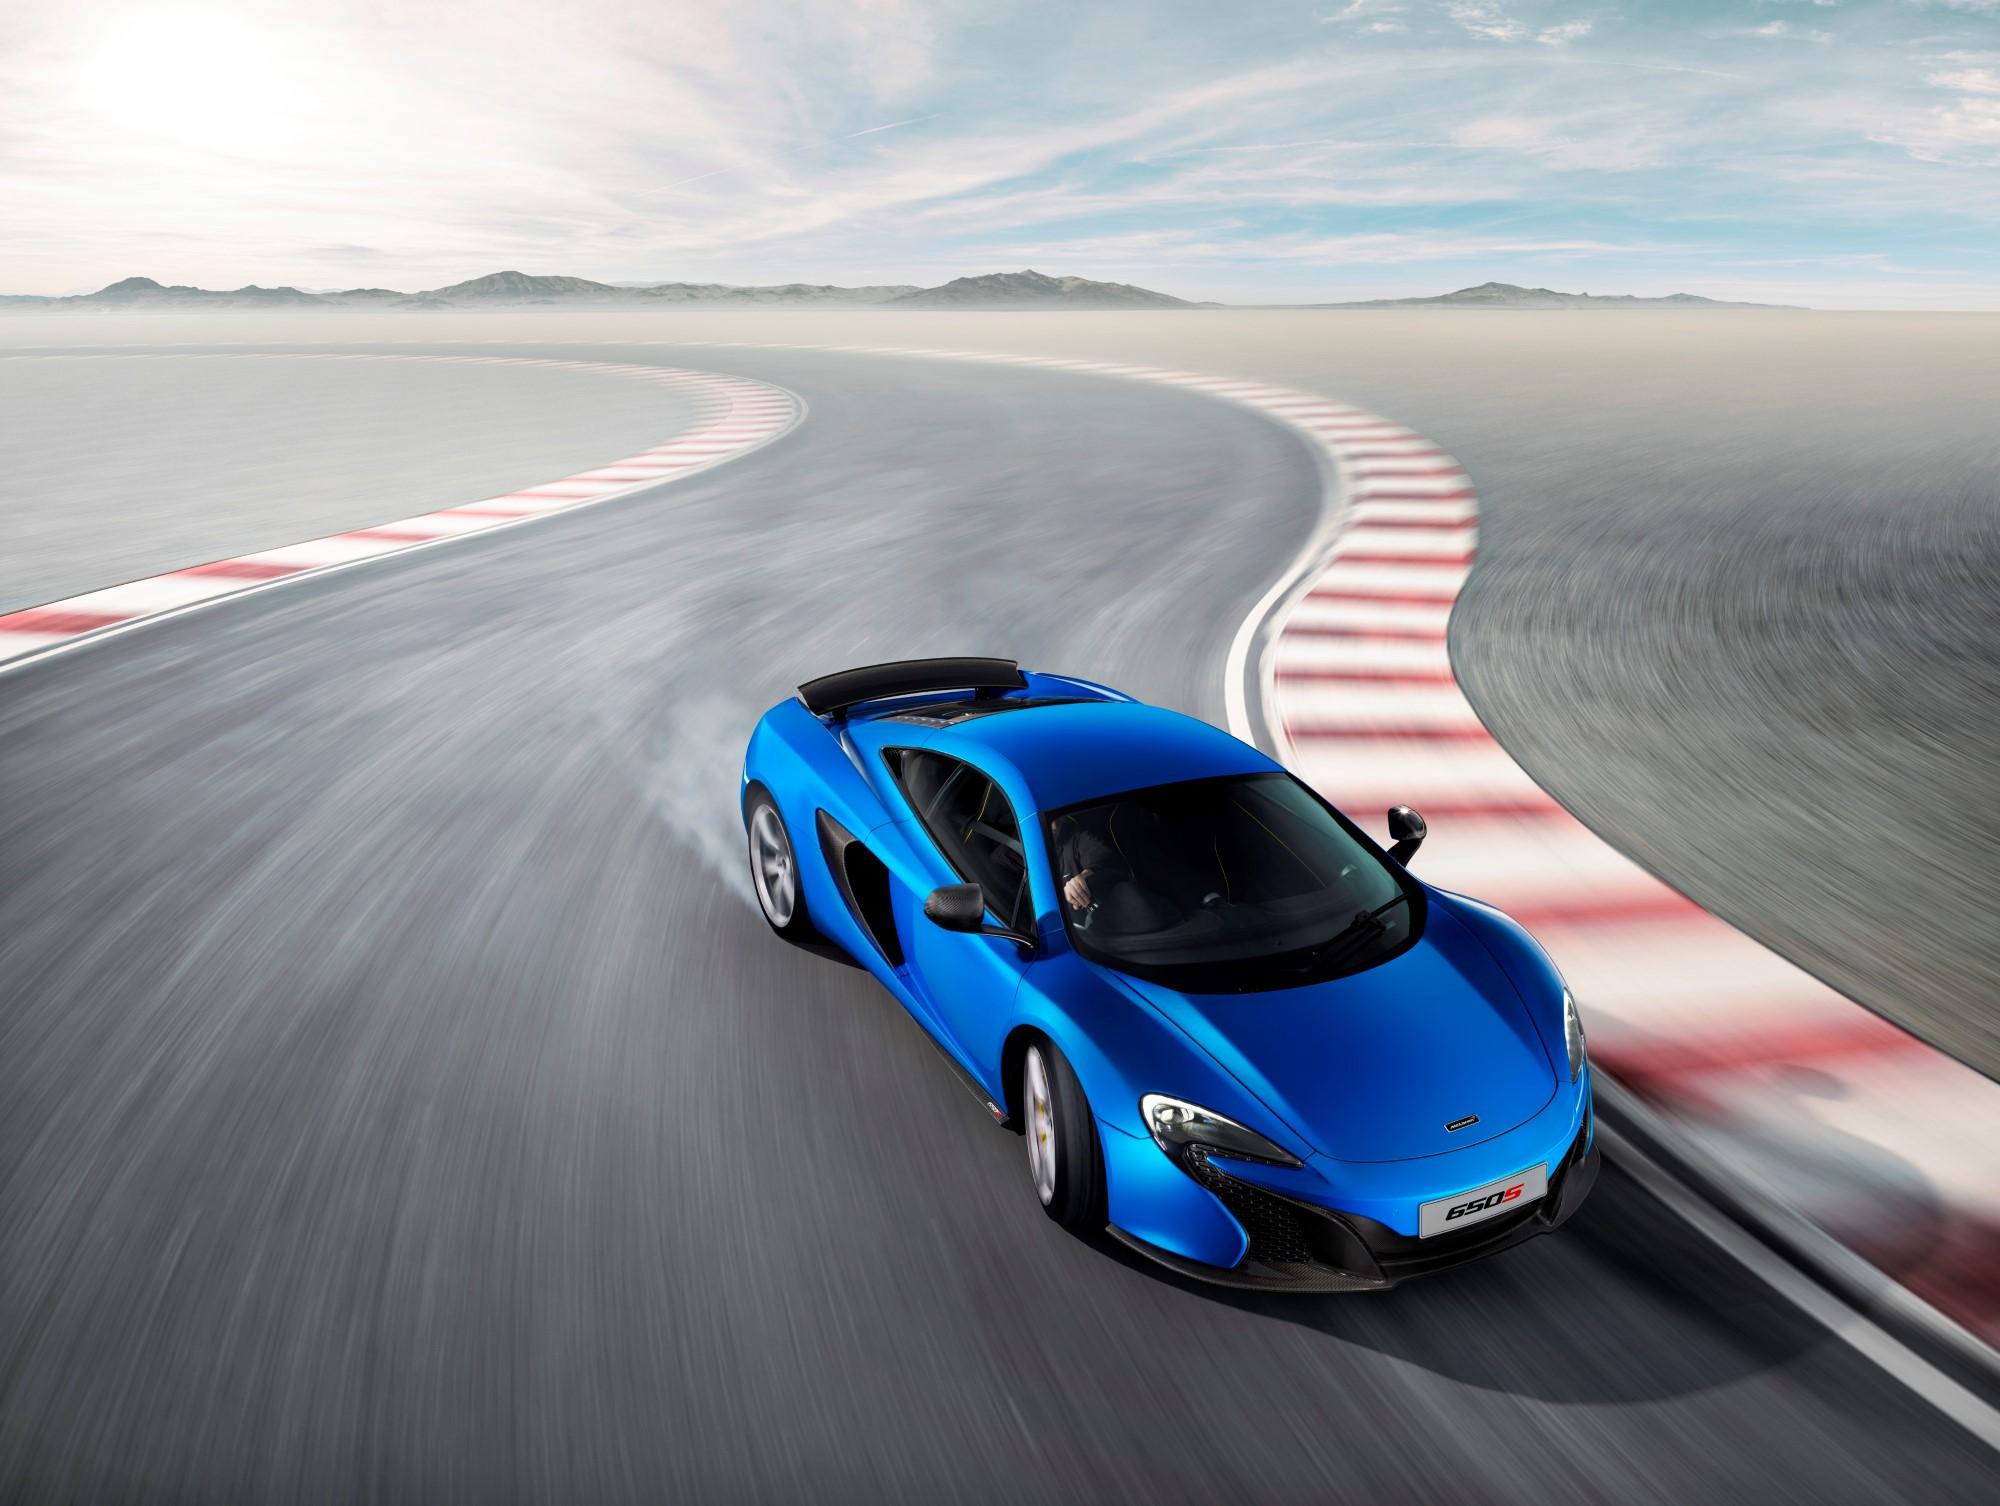 McLaren 650S Performance: 10.5 In The Quarter-Mile, 0-60 MPH In Under 3 Seconds